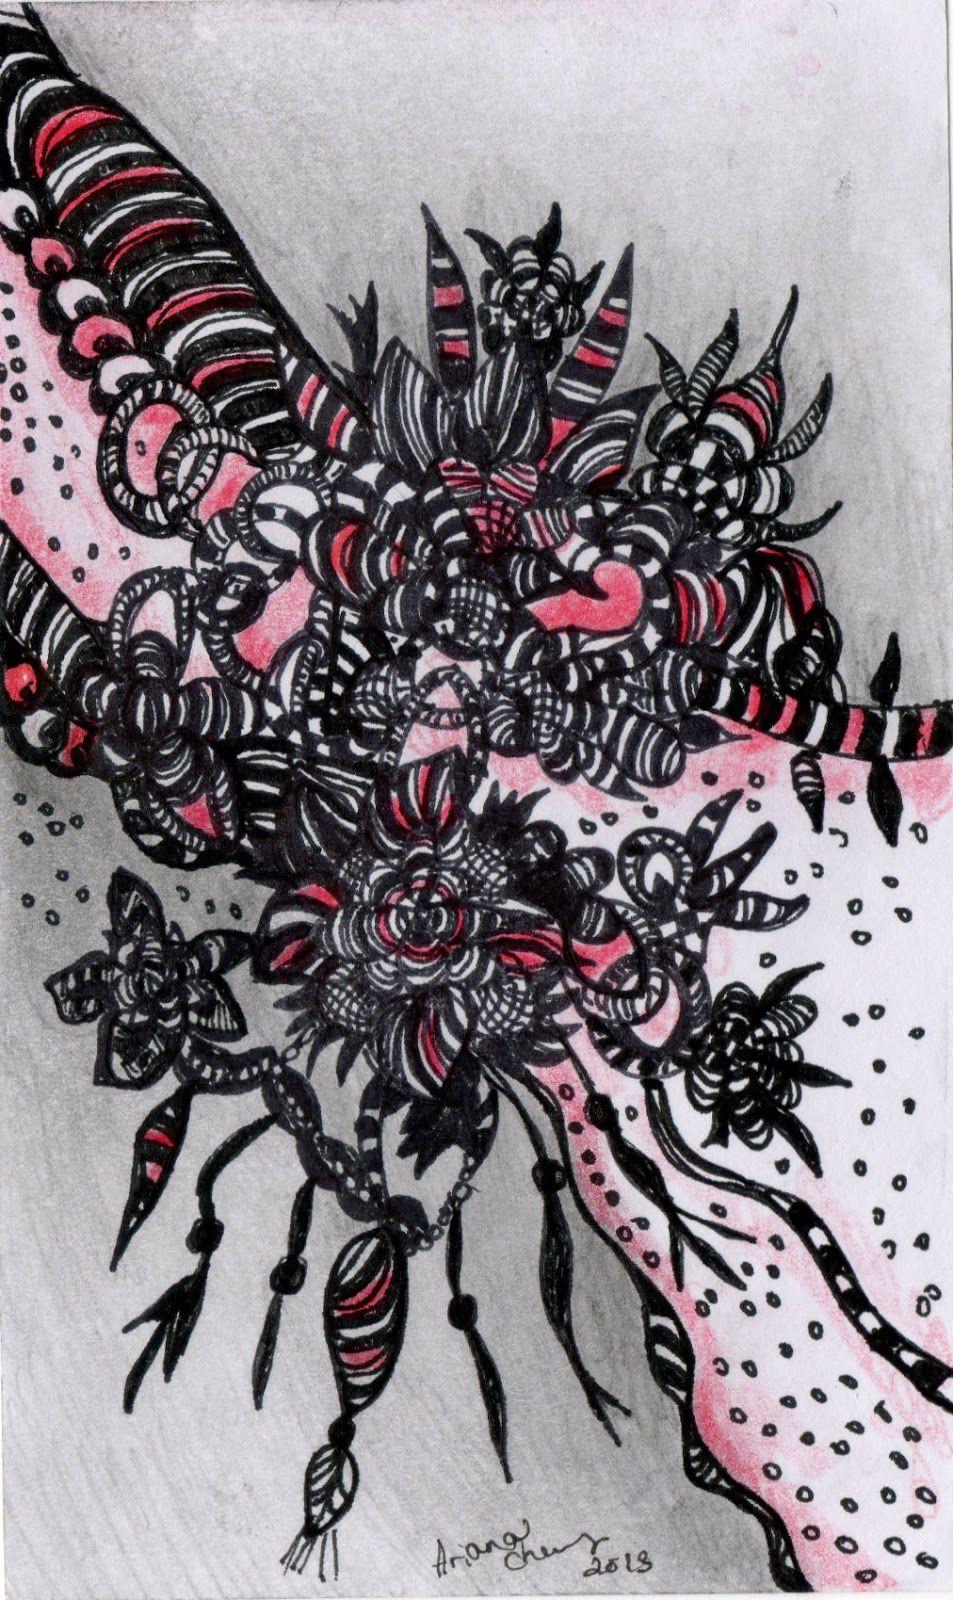 Art original abstract drawing ink zentangle inspired flower black